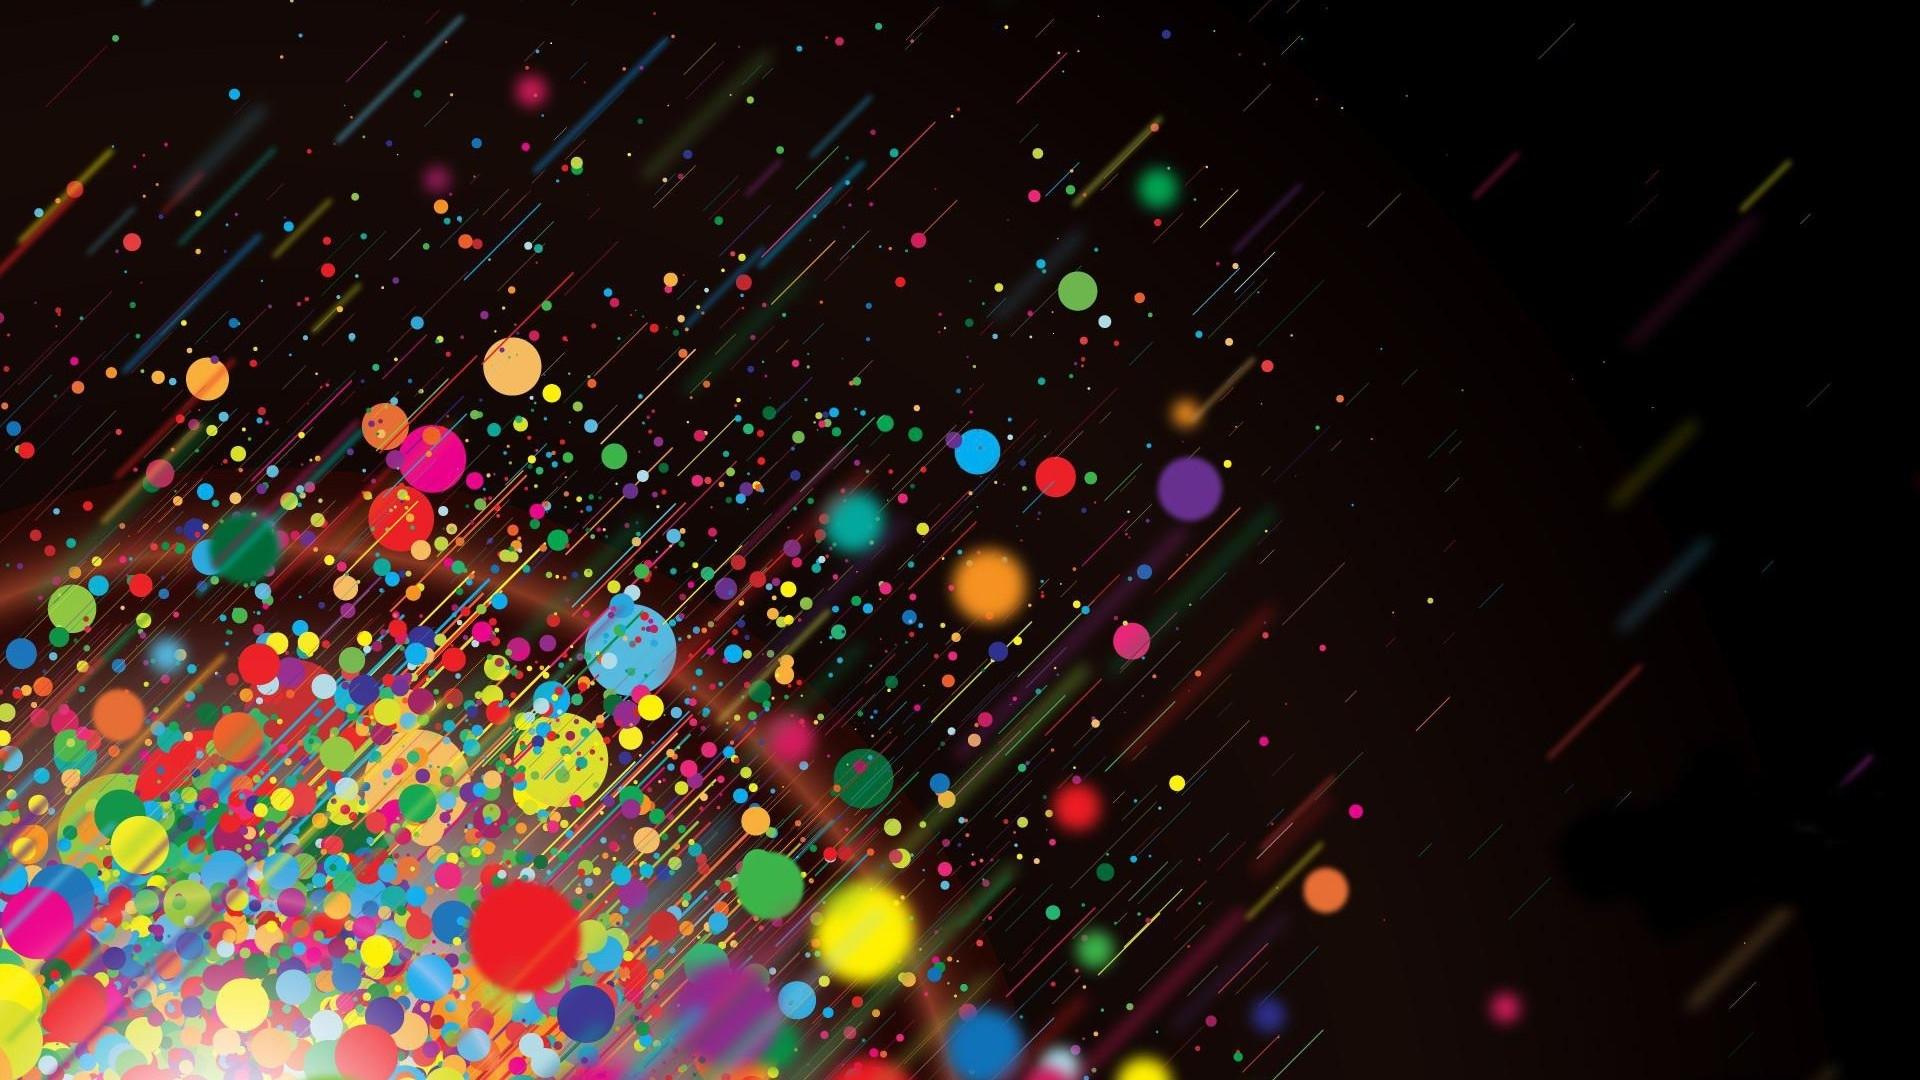 10 New Hd Wallpaper 1080P Colors FULL HD 1920×1080 For PC Desktop